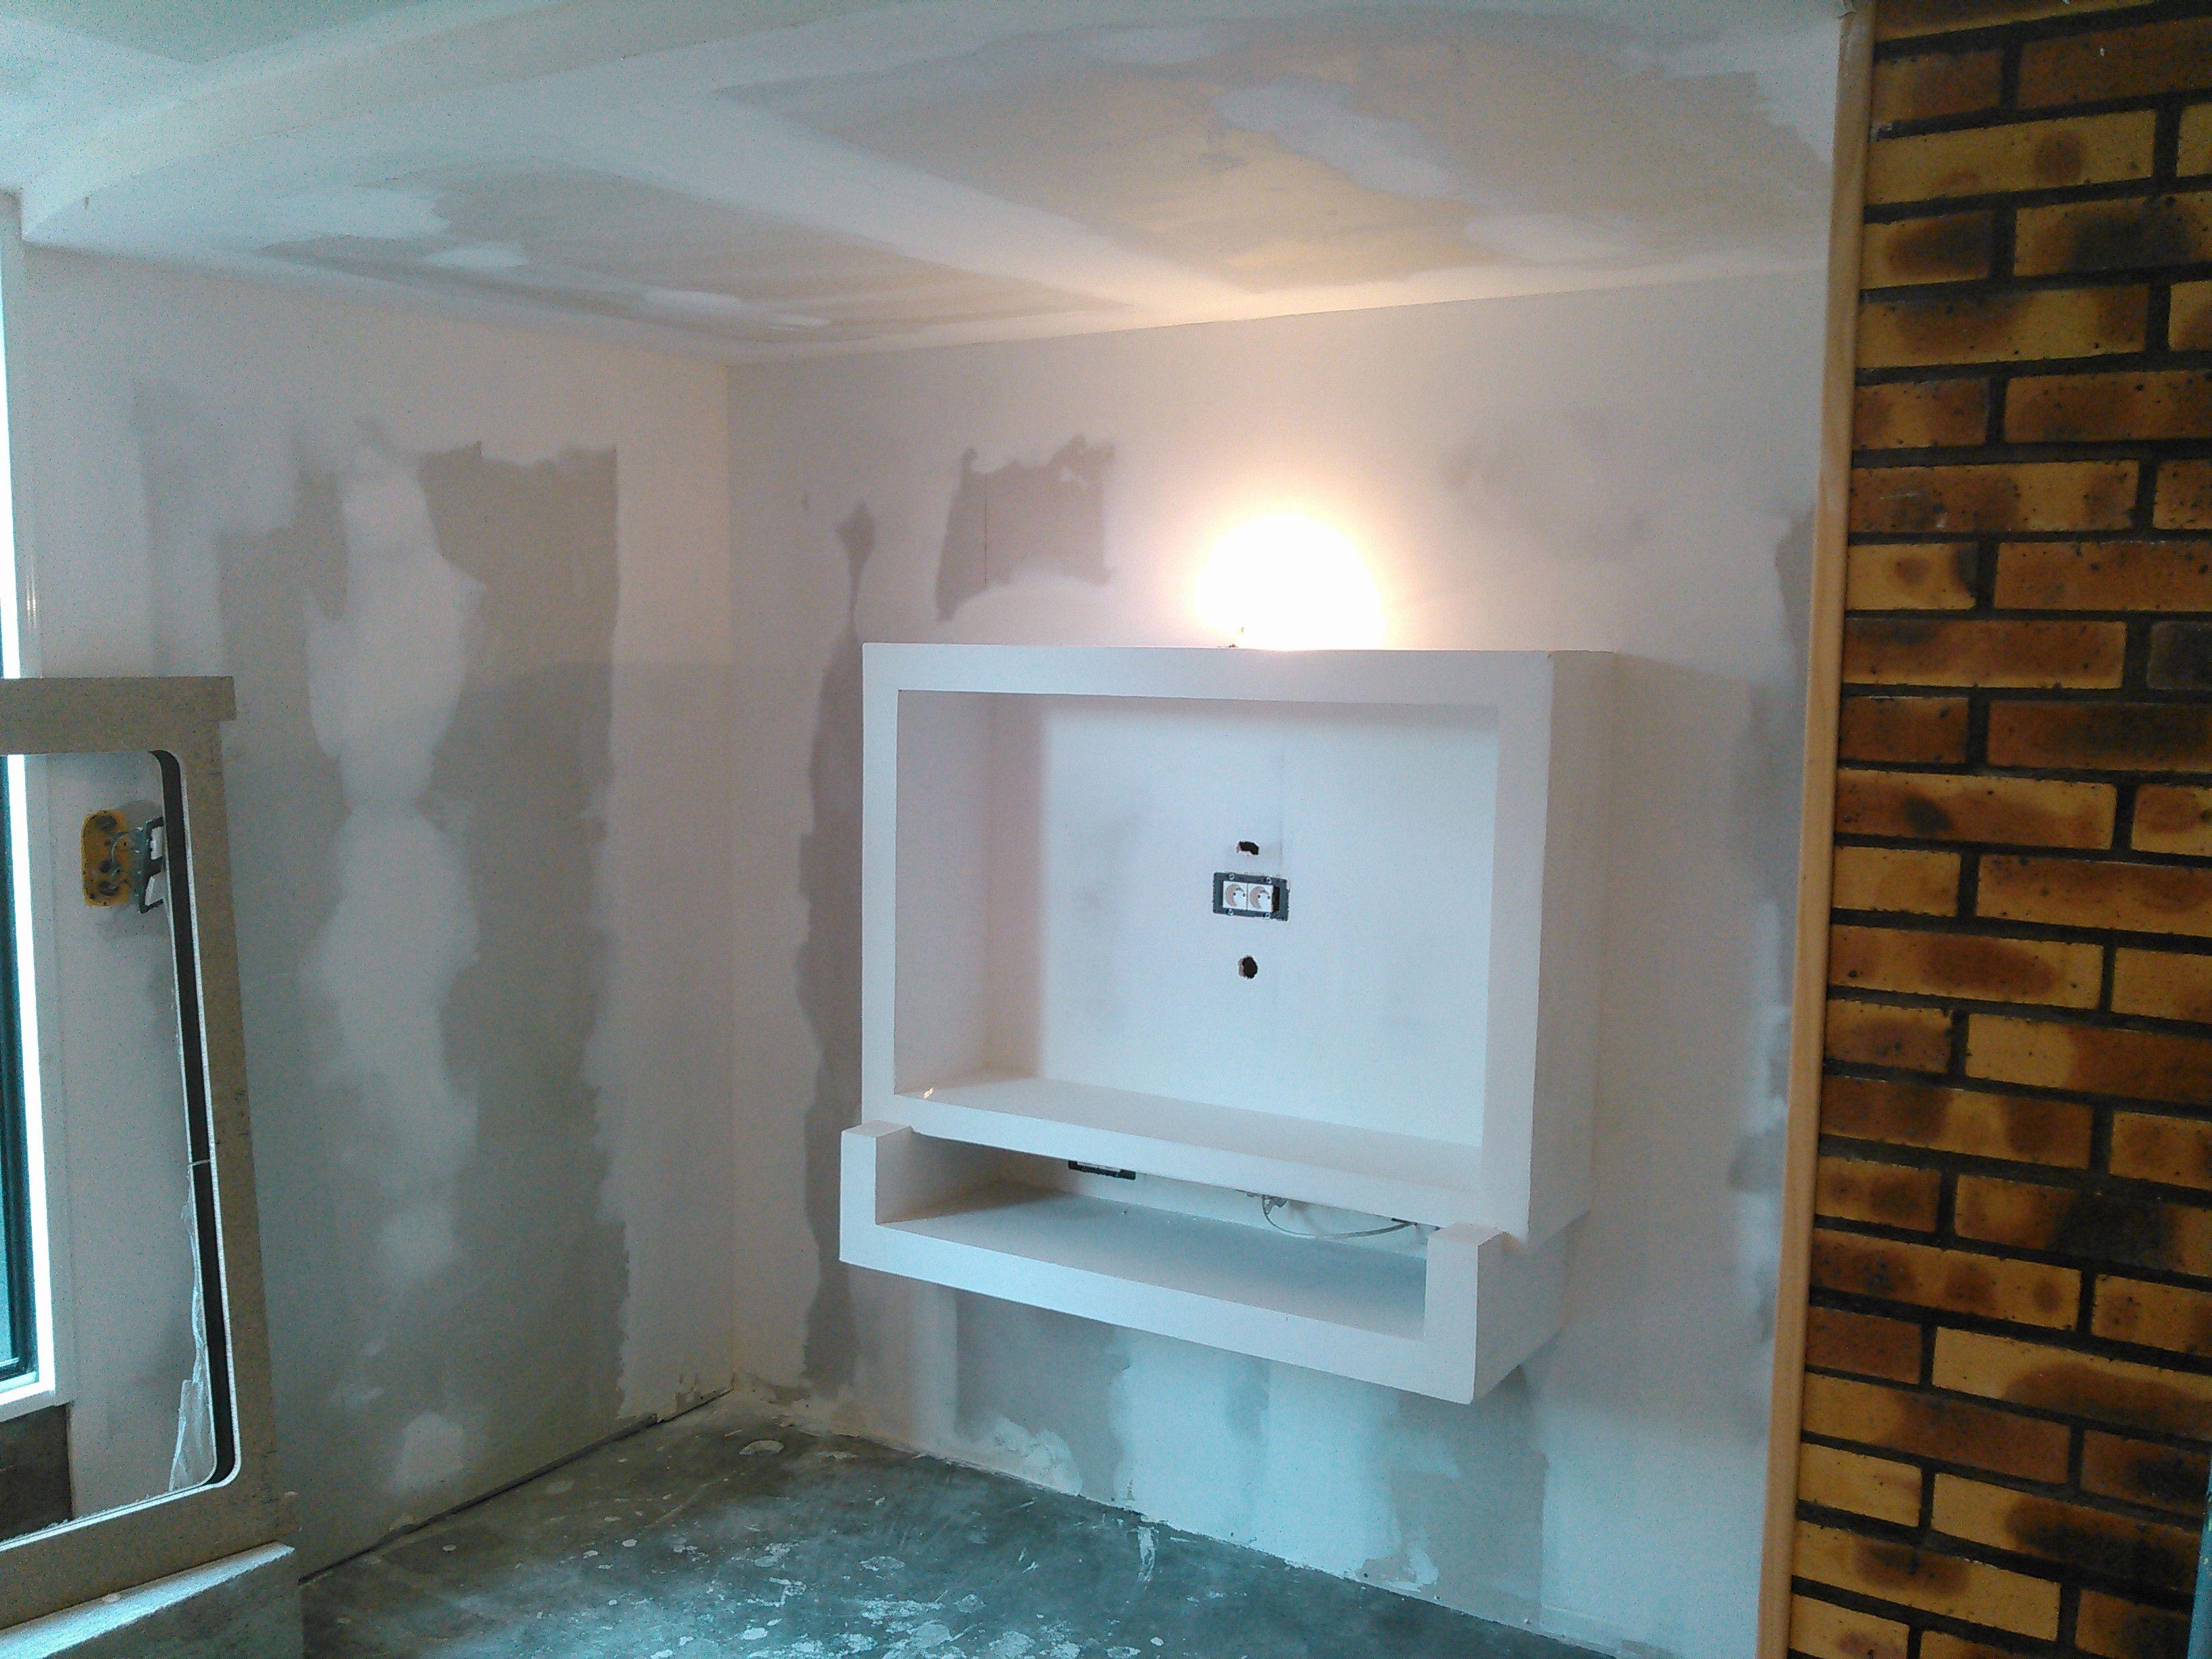 Awesome Fixation Tv Placo   Ceiling design bedroom, Bathroom ...